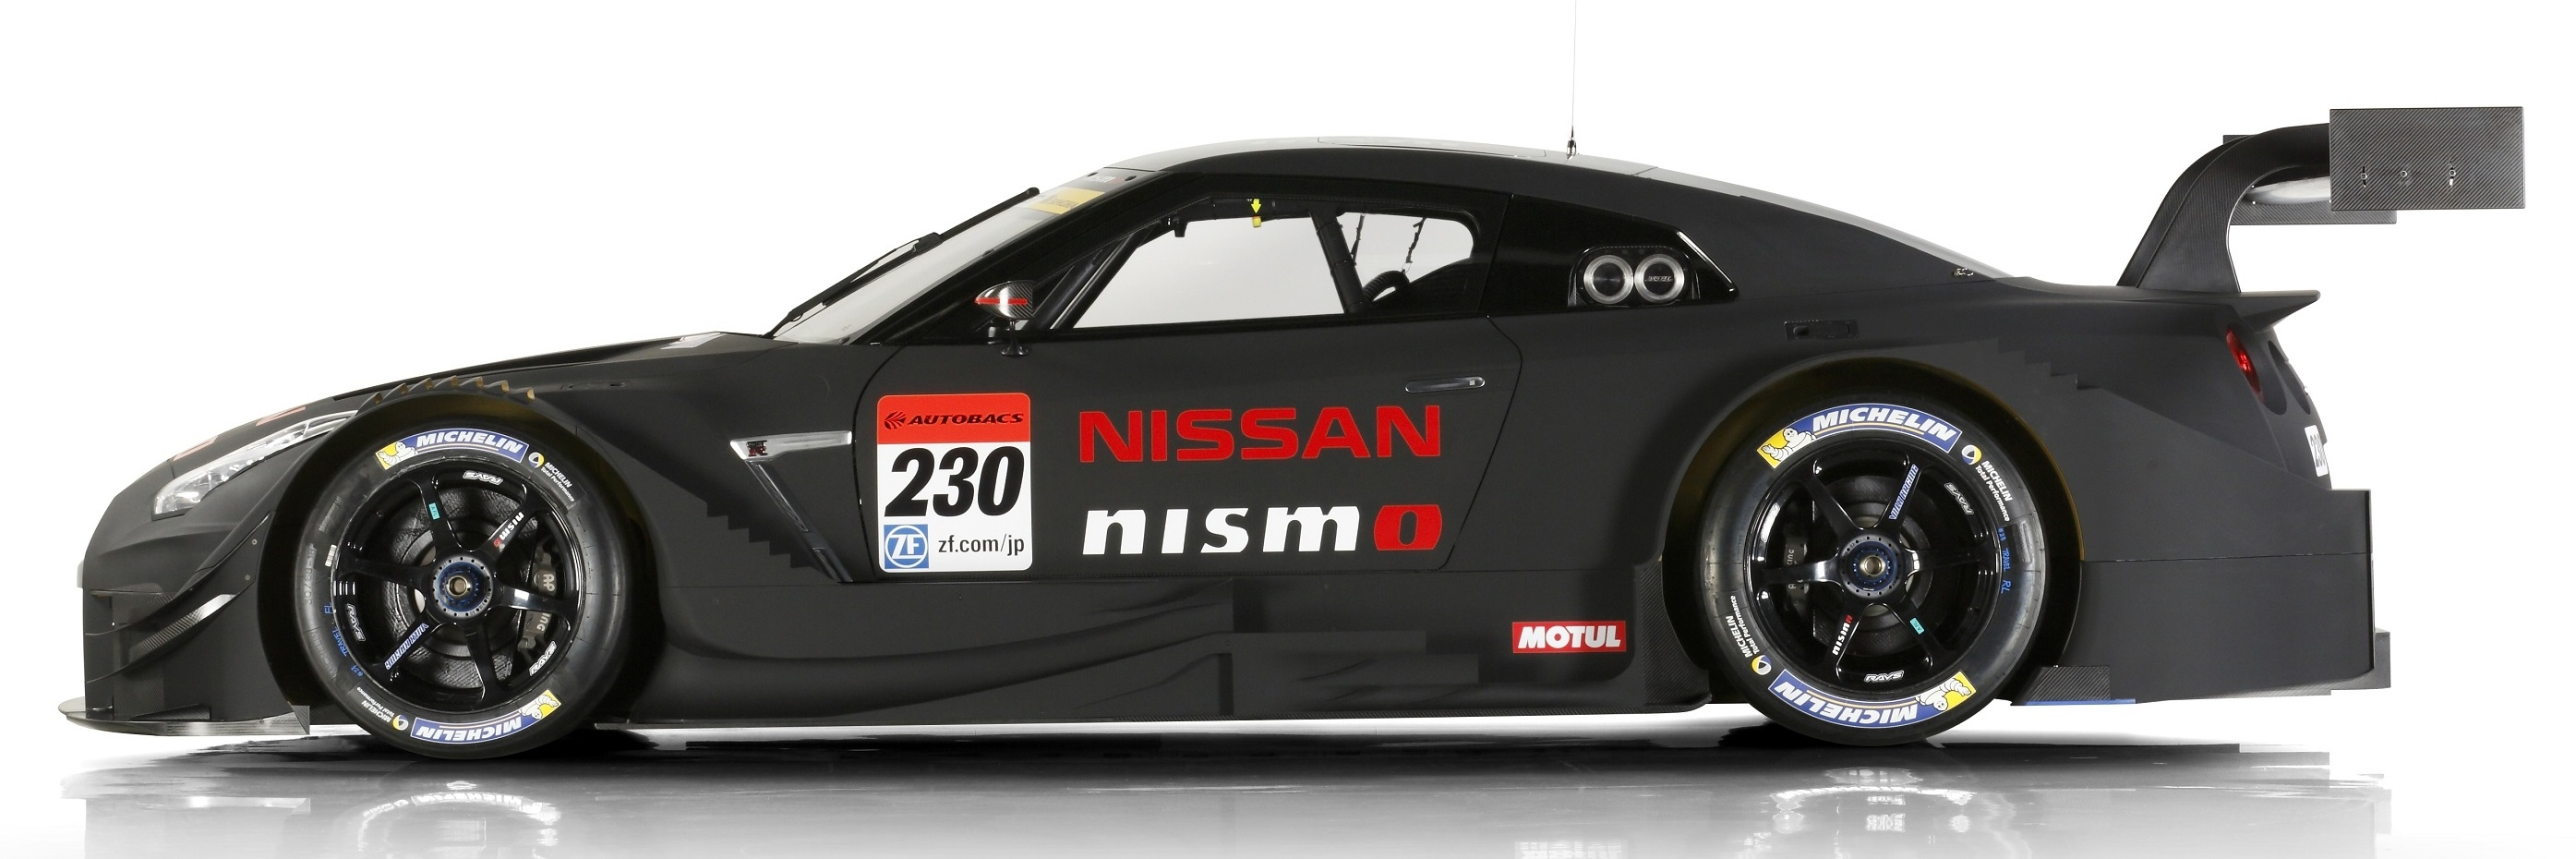 2017 Nissan Gt R Nismo Gt500 Revealed For Supergt Image 581730